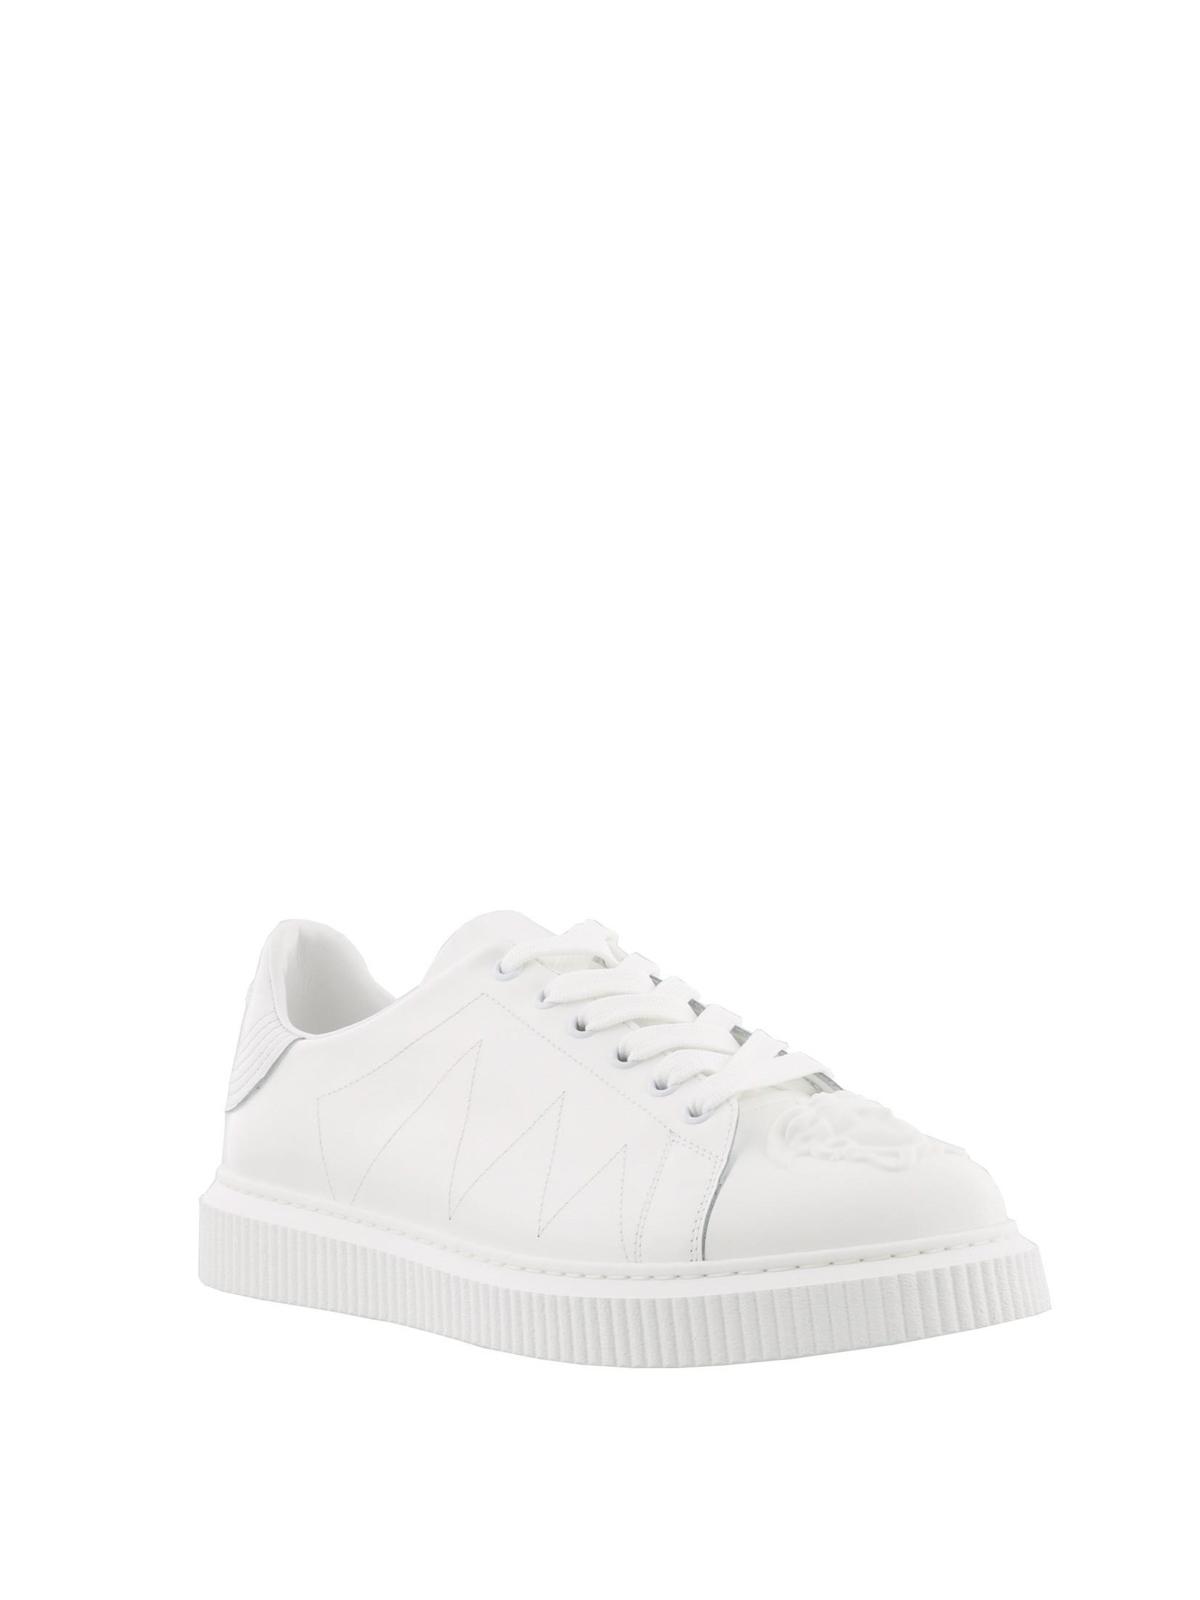 Medusa Head white leather sneakers